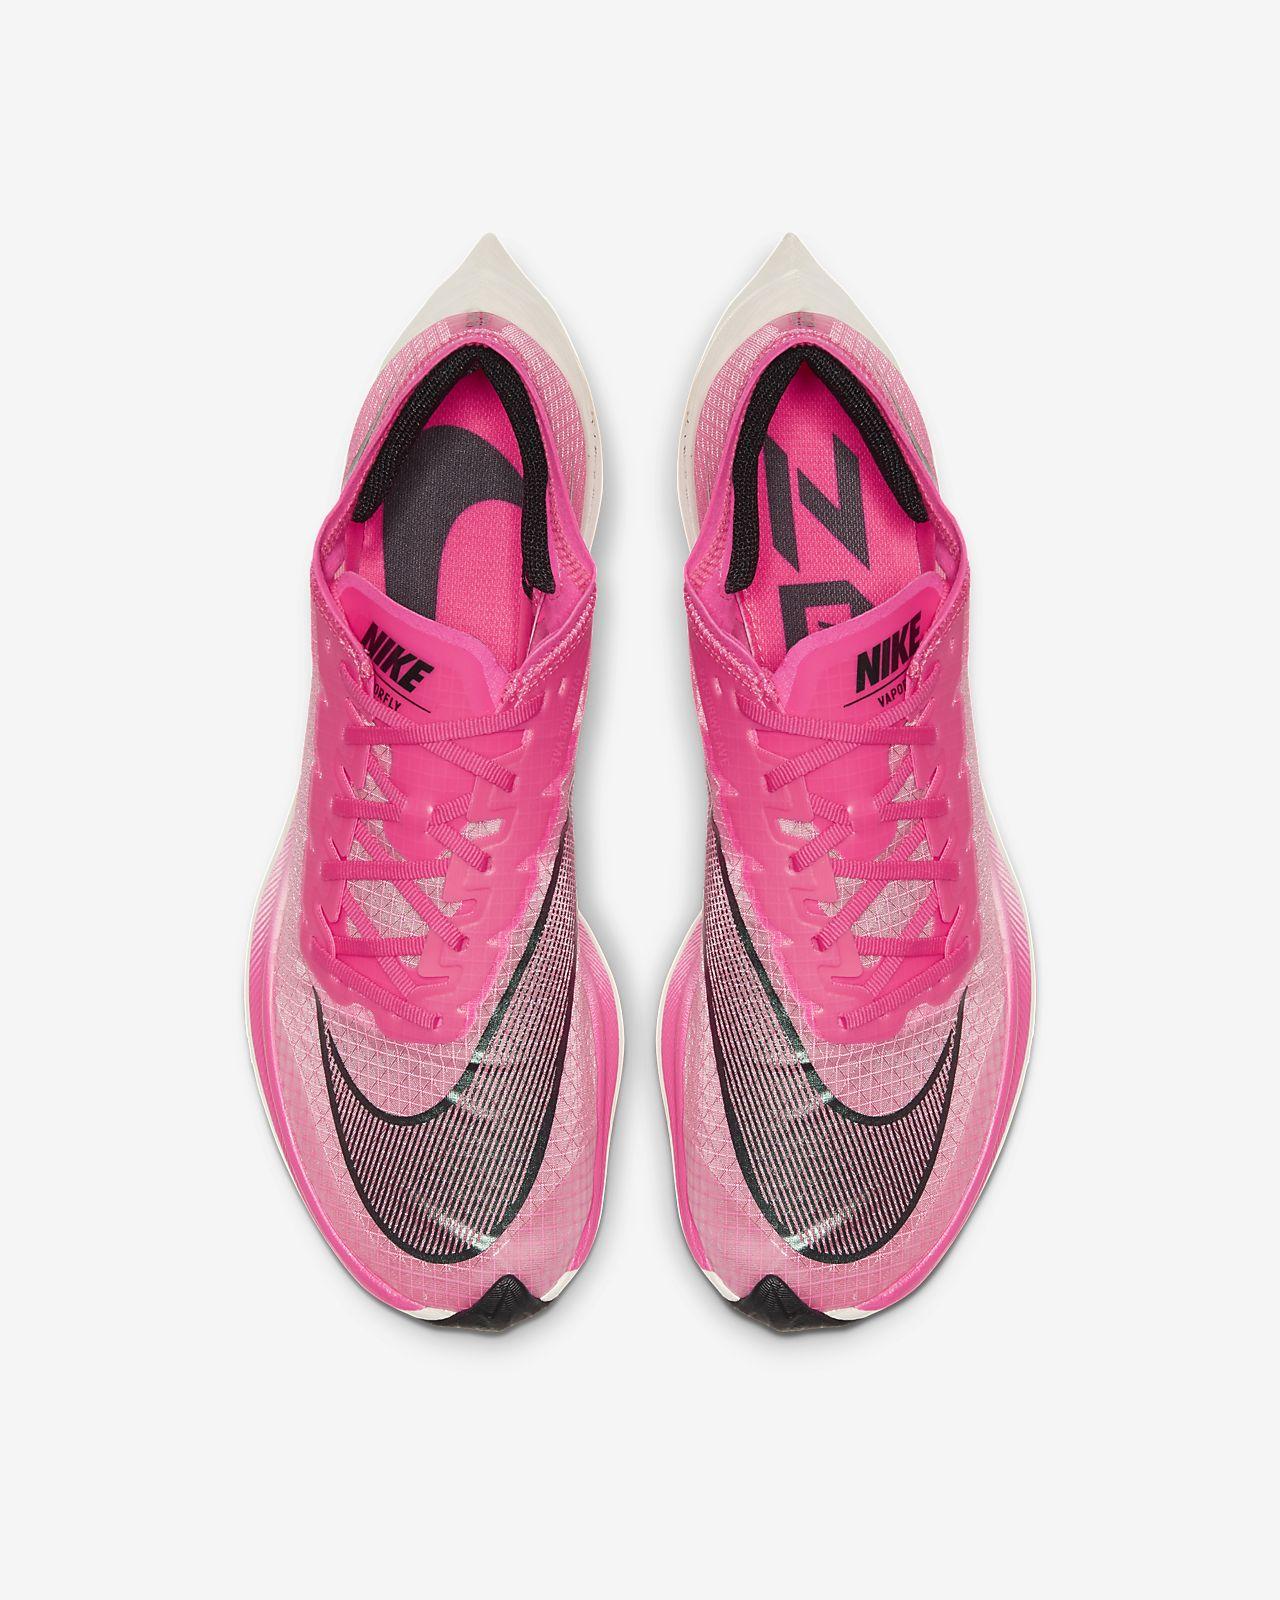 Vaporfly Nike Vaporfly Nike NEXTLaufschuh NEXTLaufschuh ZoomX ZoomX Nike RjA45L